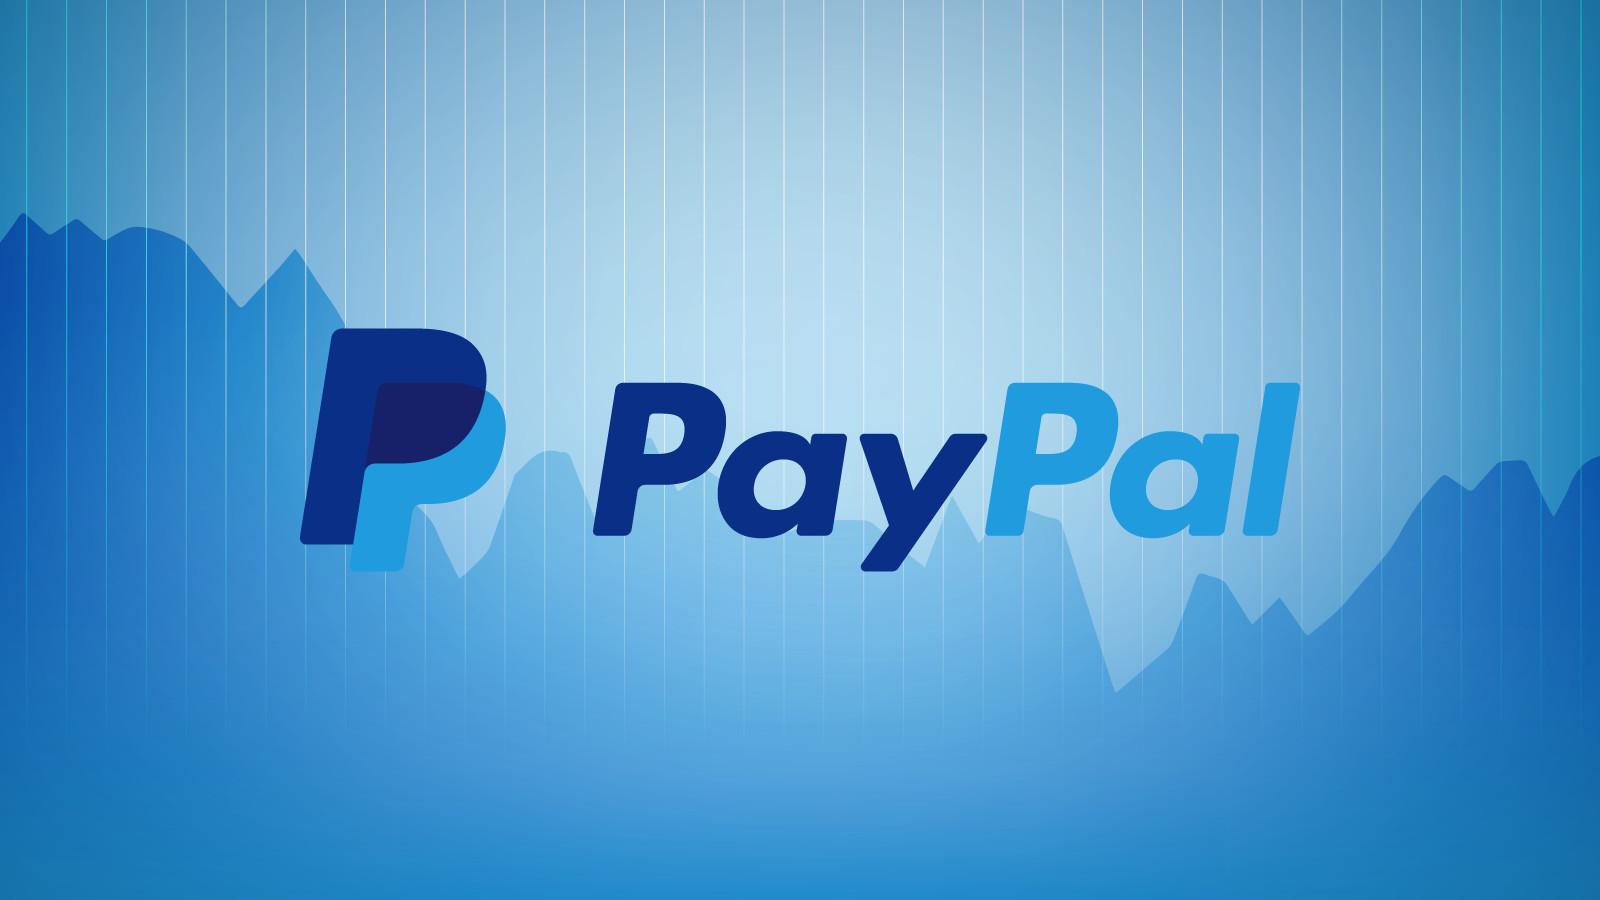 Paypal跨境電商第三方支付平台-鯊客科技SEO優化公司